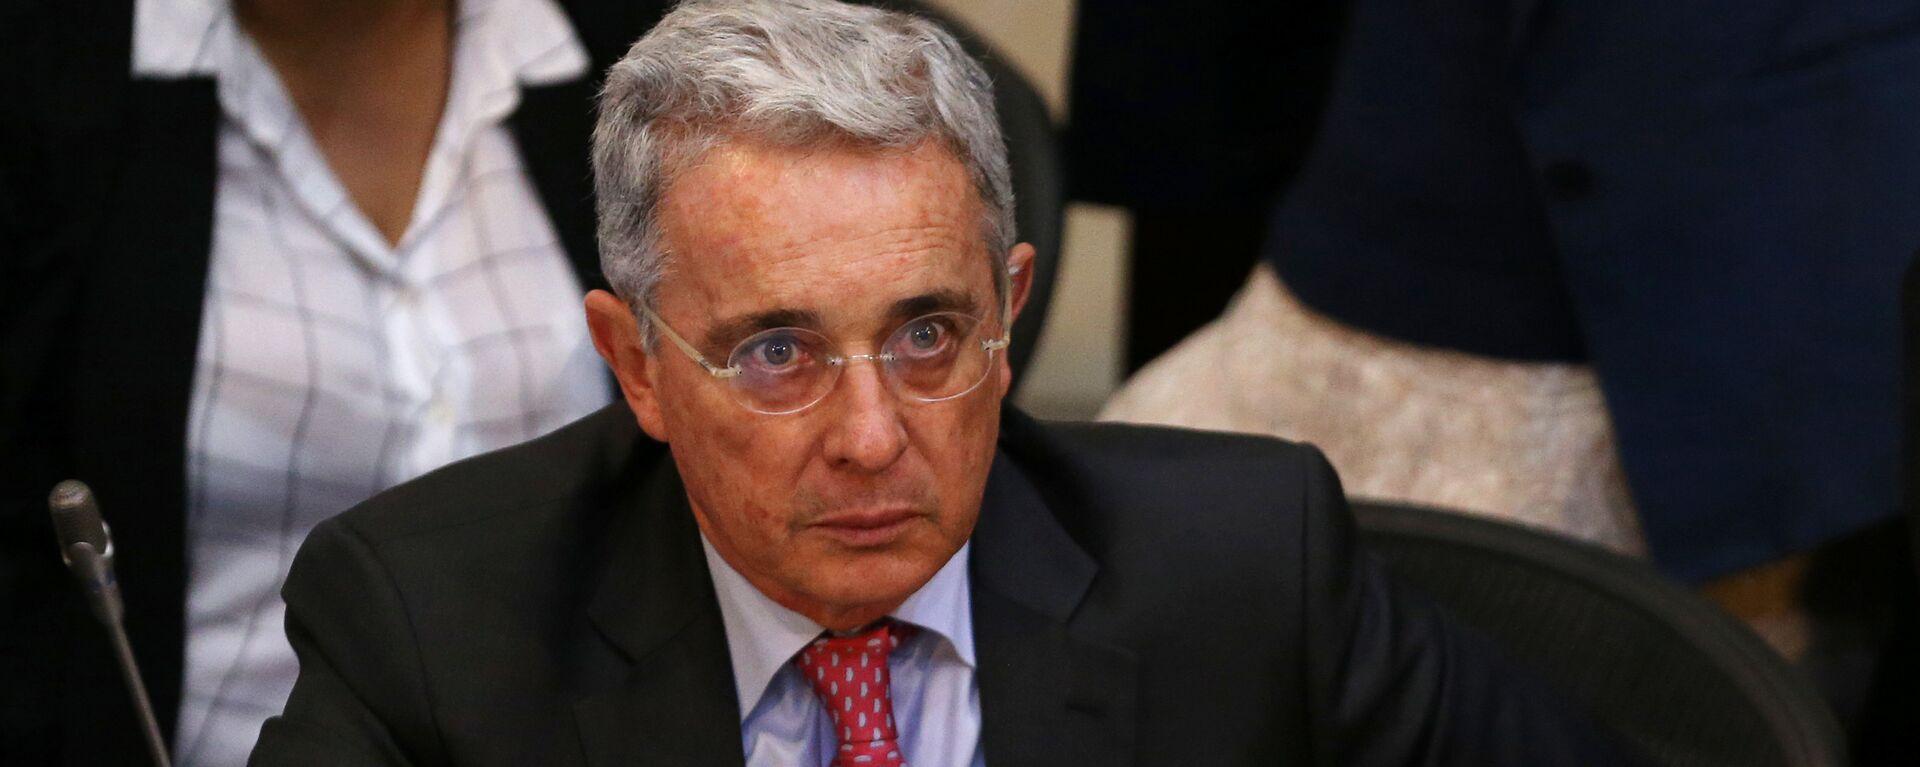 Senator Alvaro Uribe, Colombia's former president, attends a debate at the congress in Bogota - Sputnik Mundo, 1920, 17.08.2021